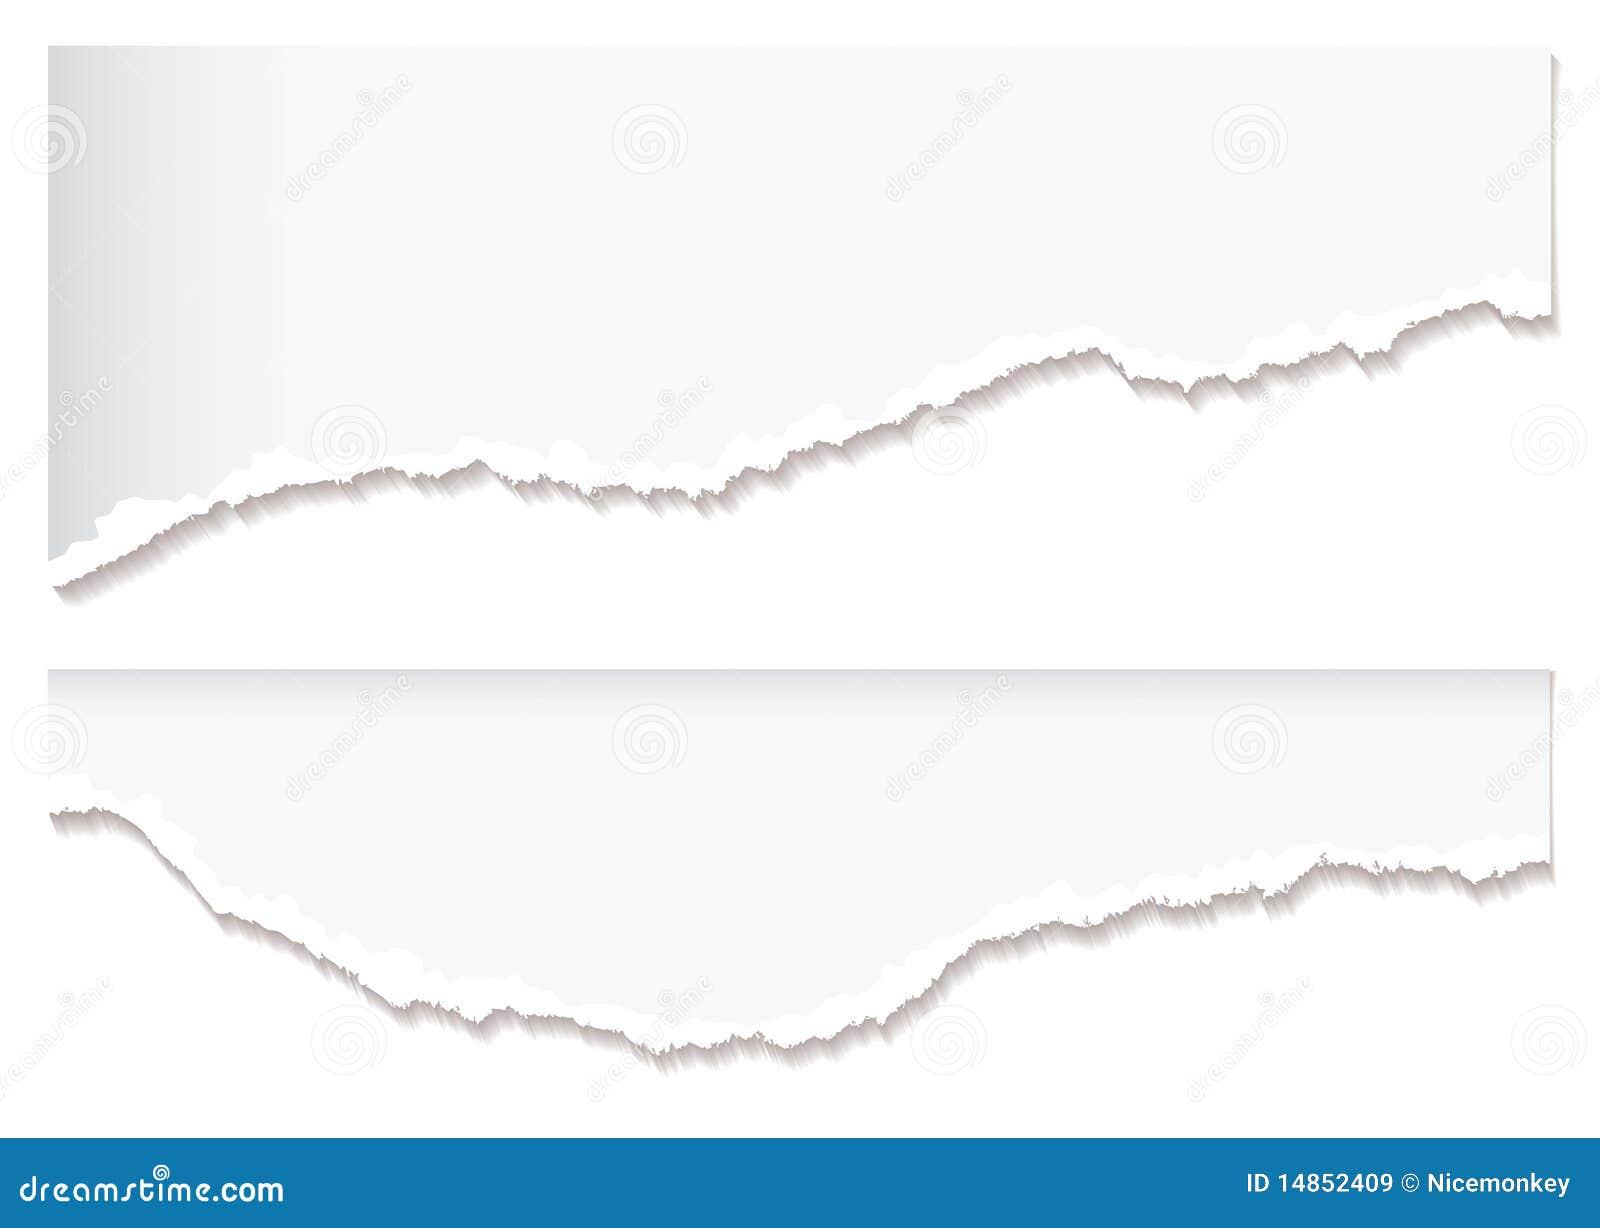 White paper rip edge